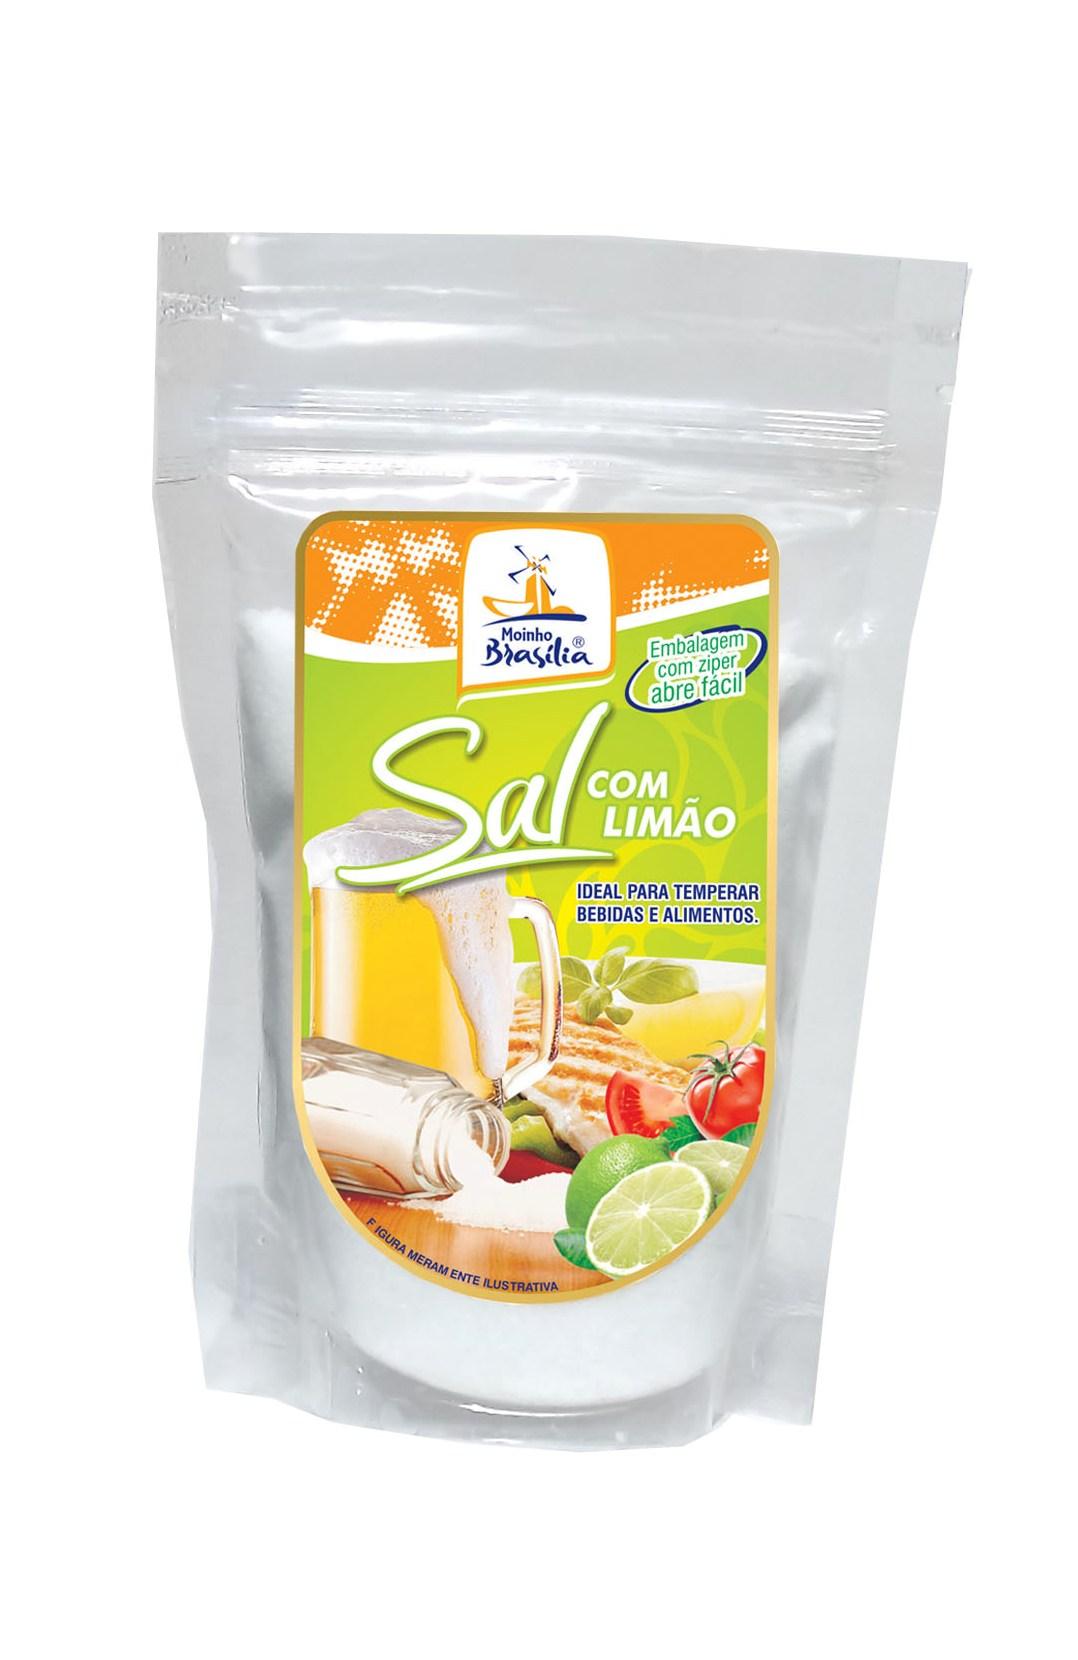 Cod 498-Sal com limao (pouch) 200g